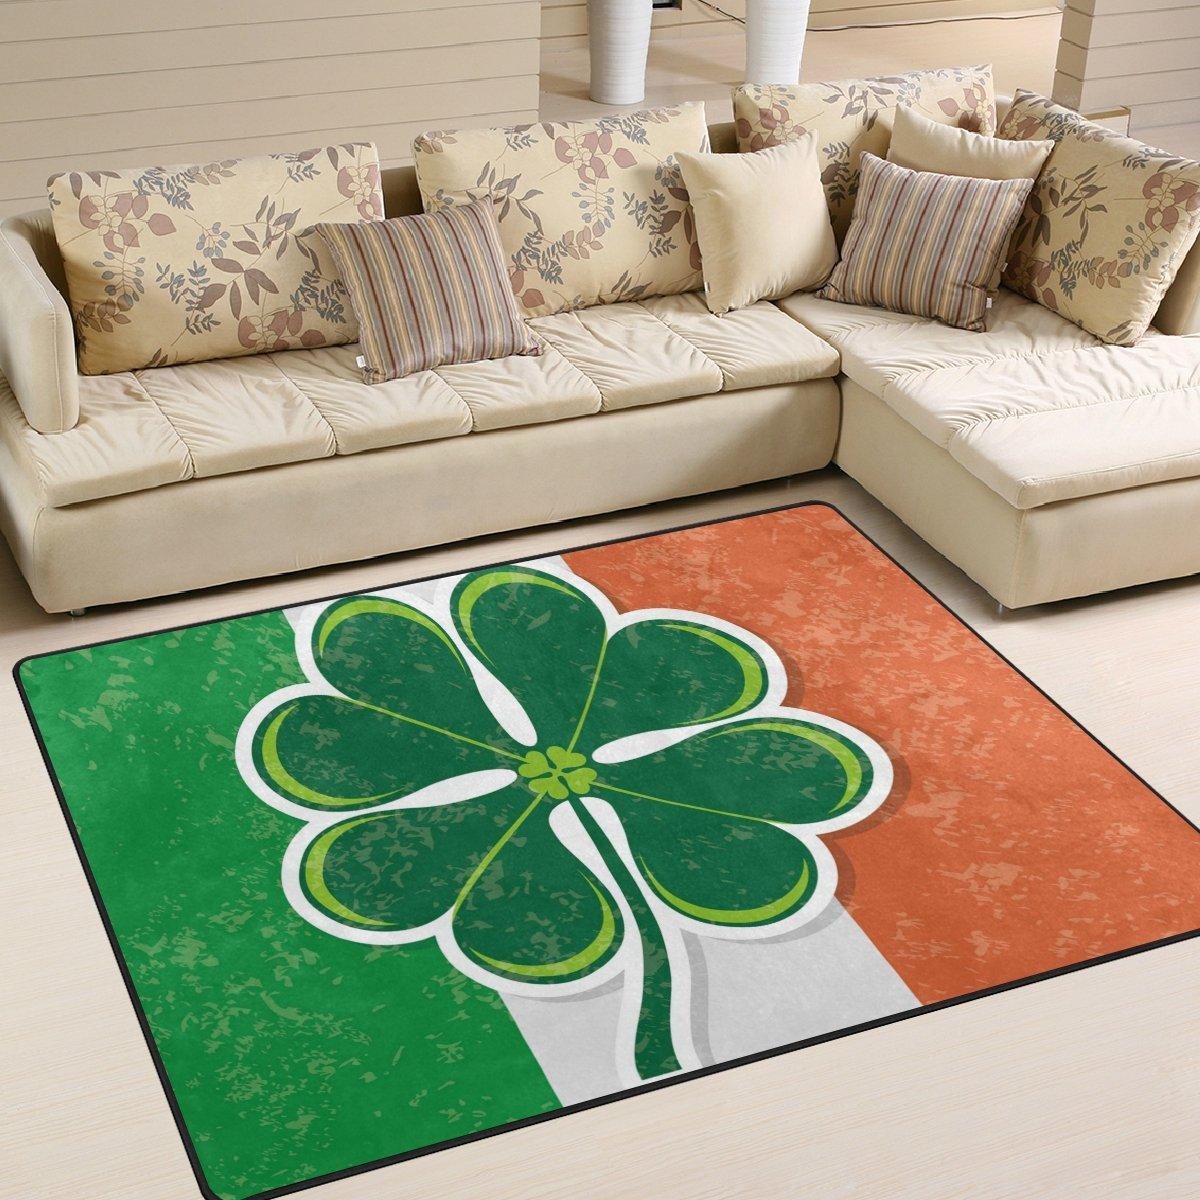 YZGO Grunge Clover Design Flag Kids Area Rug,Green Irish Day Non-Slip Floor Mat Soft Resting Area Doormats for Living Dining Bedroom 5.3' x 4'